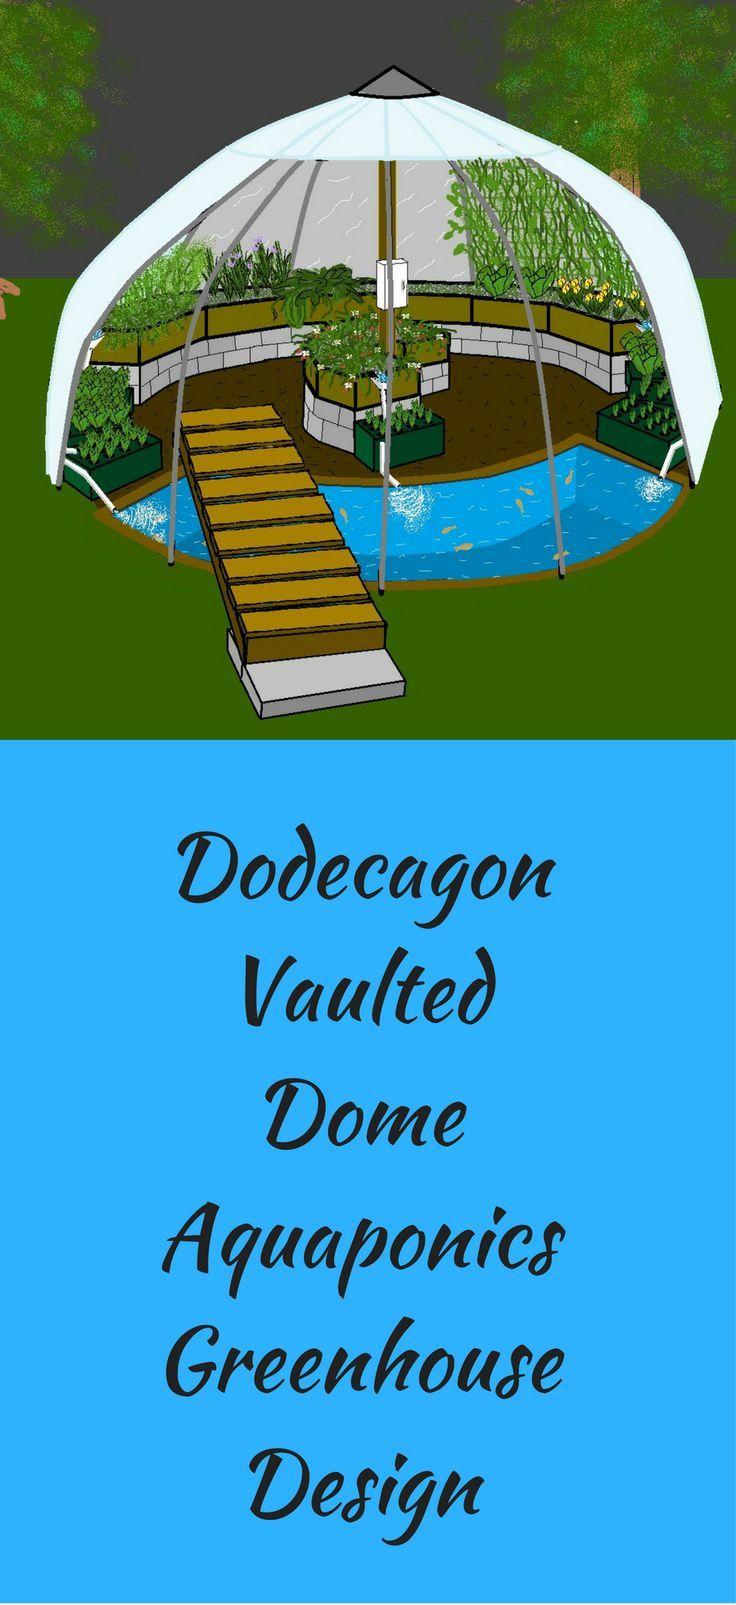 Dodecagon Vaulted Dome Aquaponics Greenhouse Design vid.staged.com/LOht